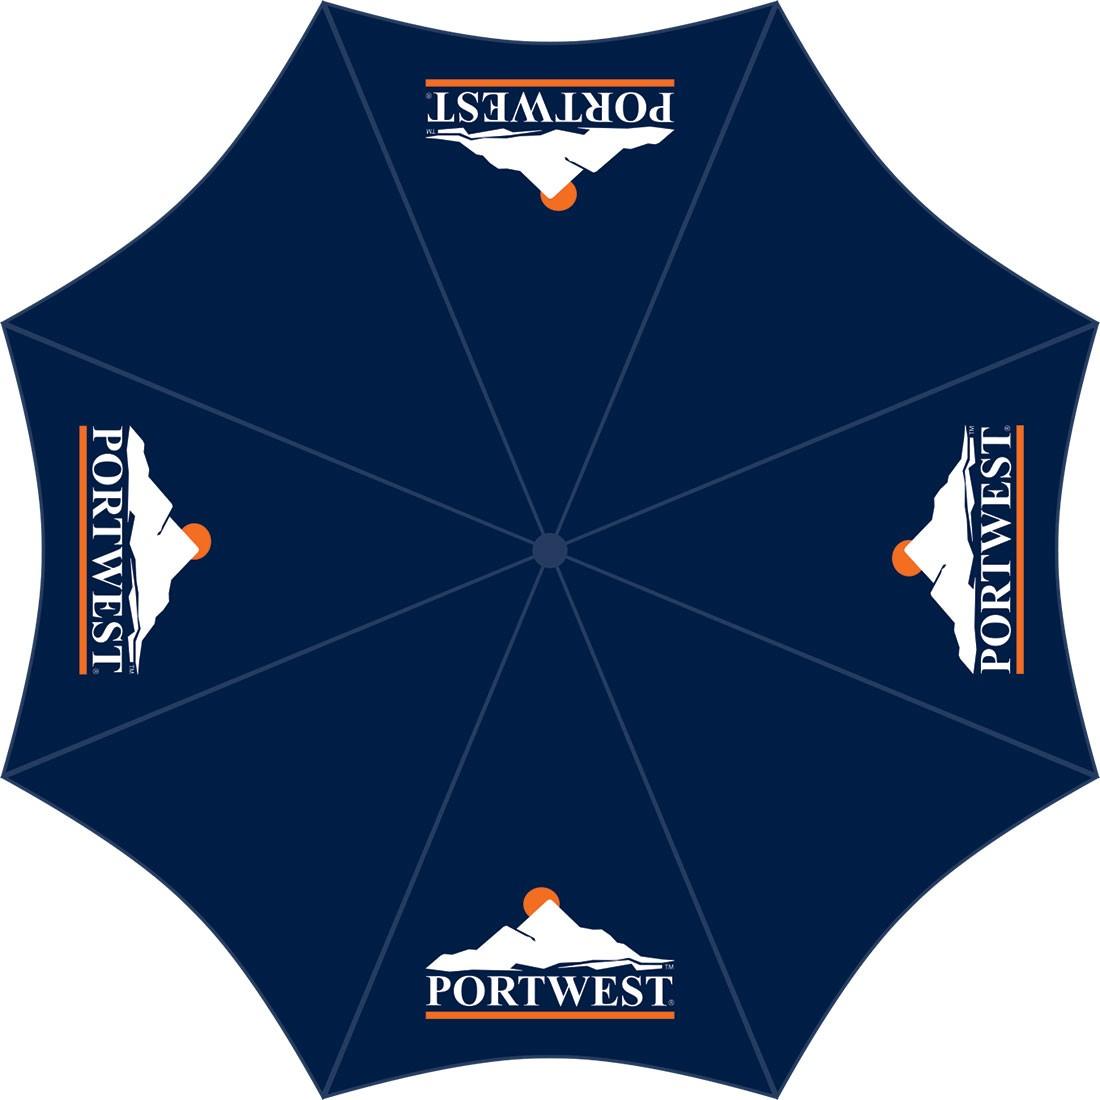 Portwest Golf Umbrella